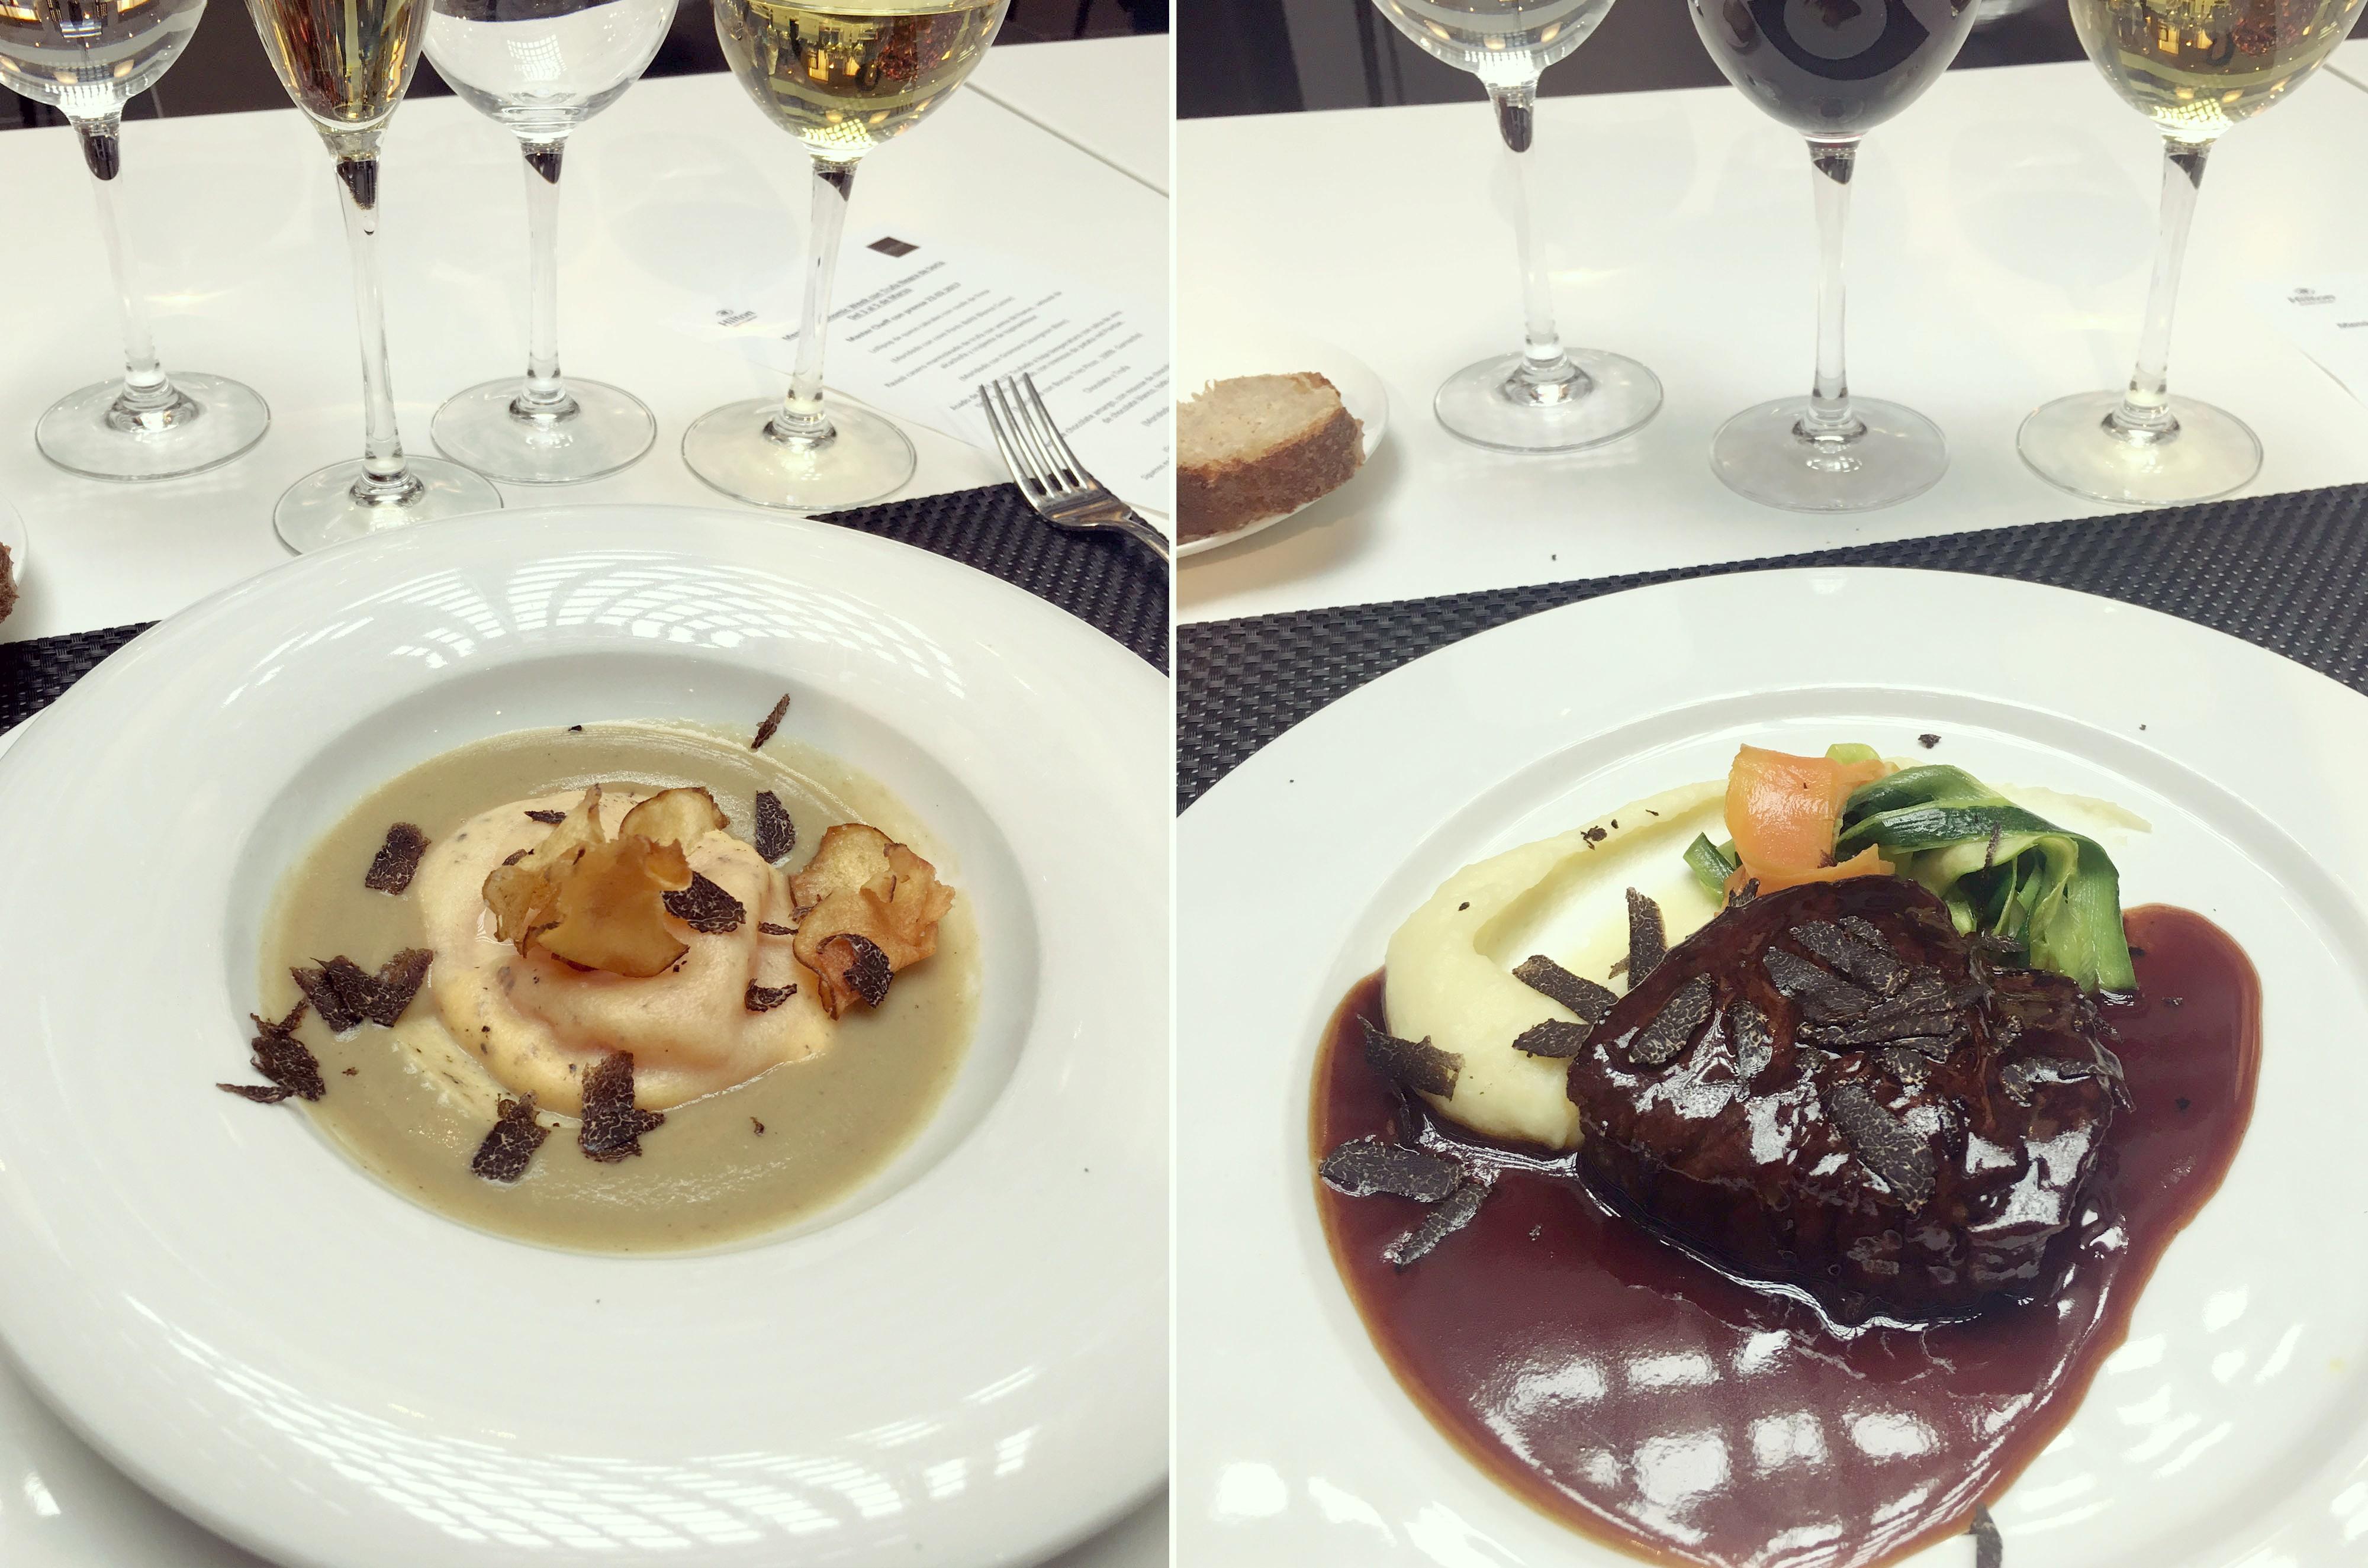 Semana-gastronomica-hilton-madrid-airport-ravioli-con-trufa-ChicAdicta-beff-fillet-foodie-Chic-Adicta-PiensaenChic-Piensa-en-Chic